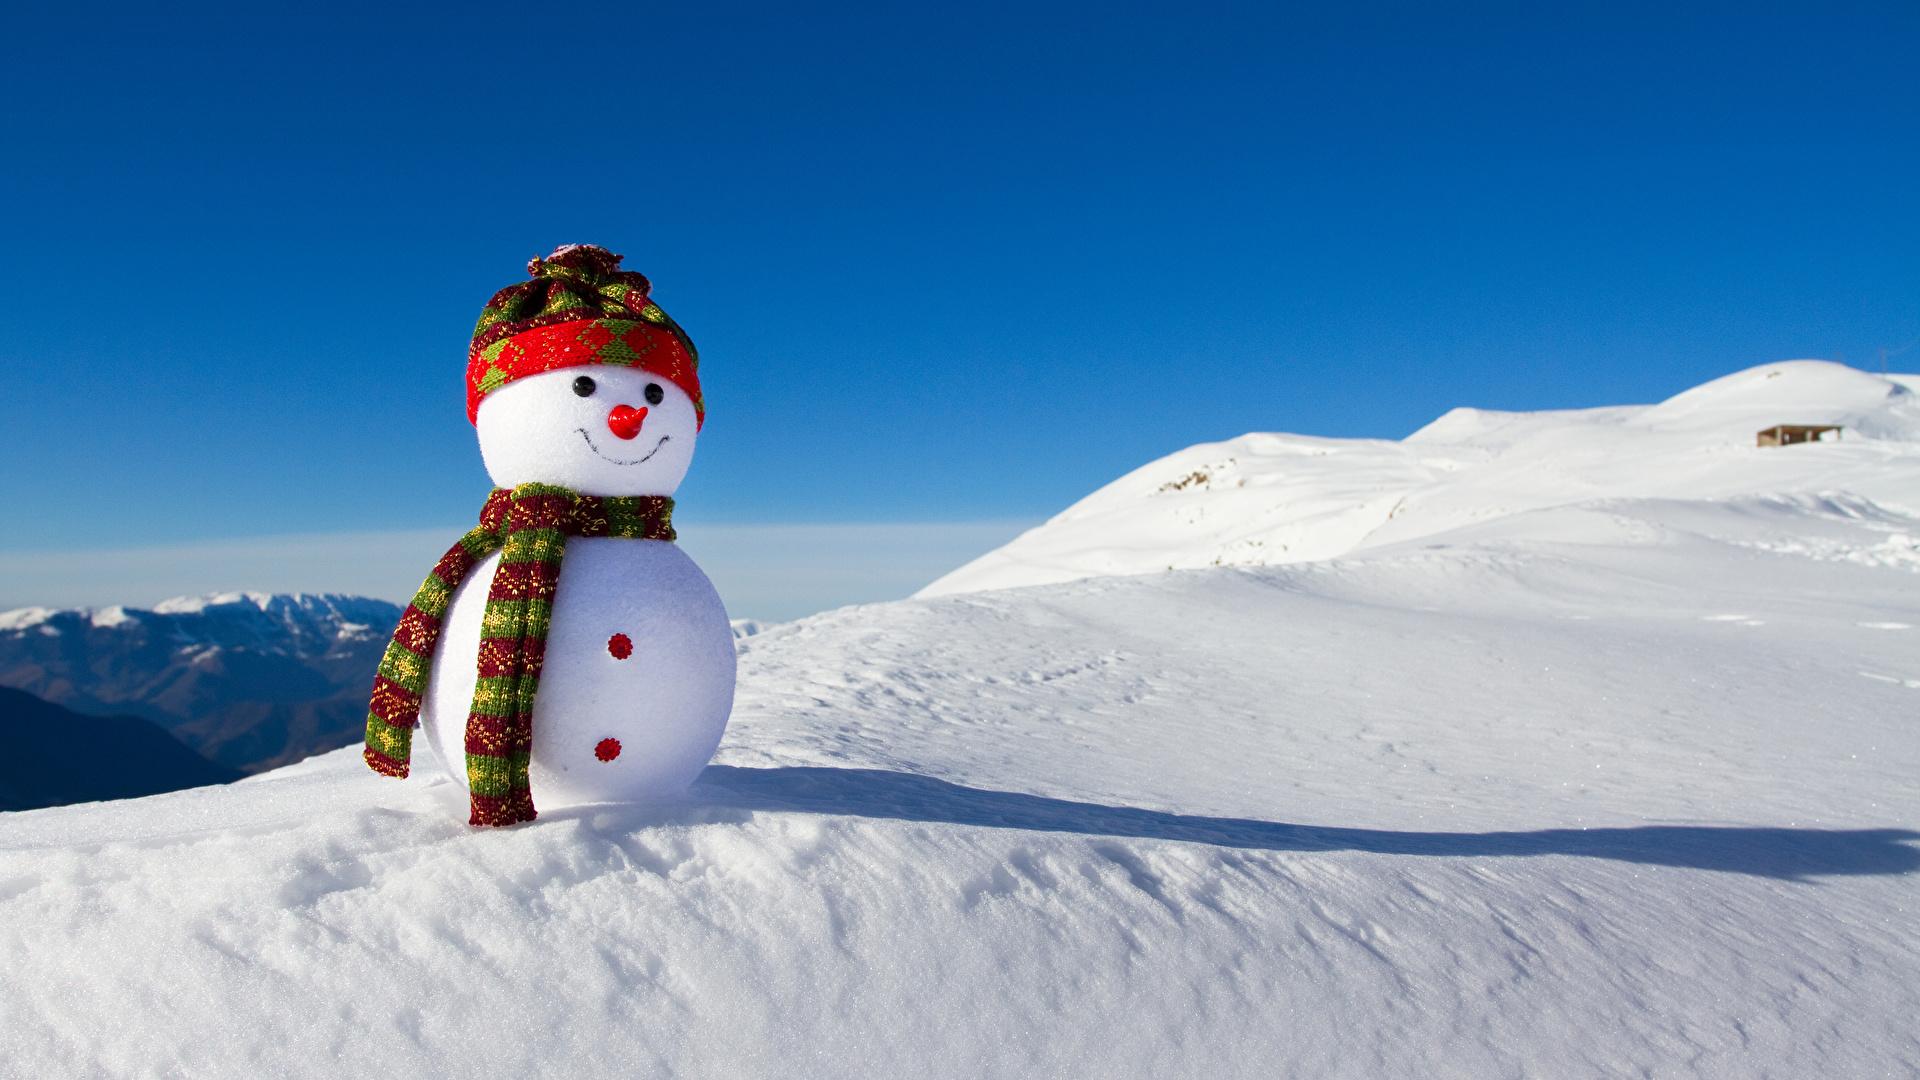 Wallpaper Scarf Winter Nature Winter Hat Snow Snowmen 1920x1080